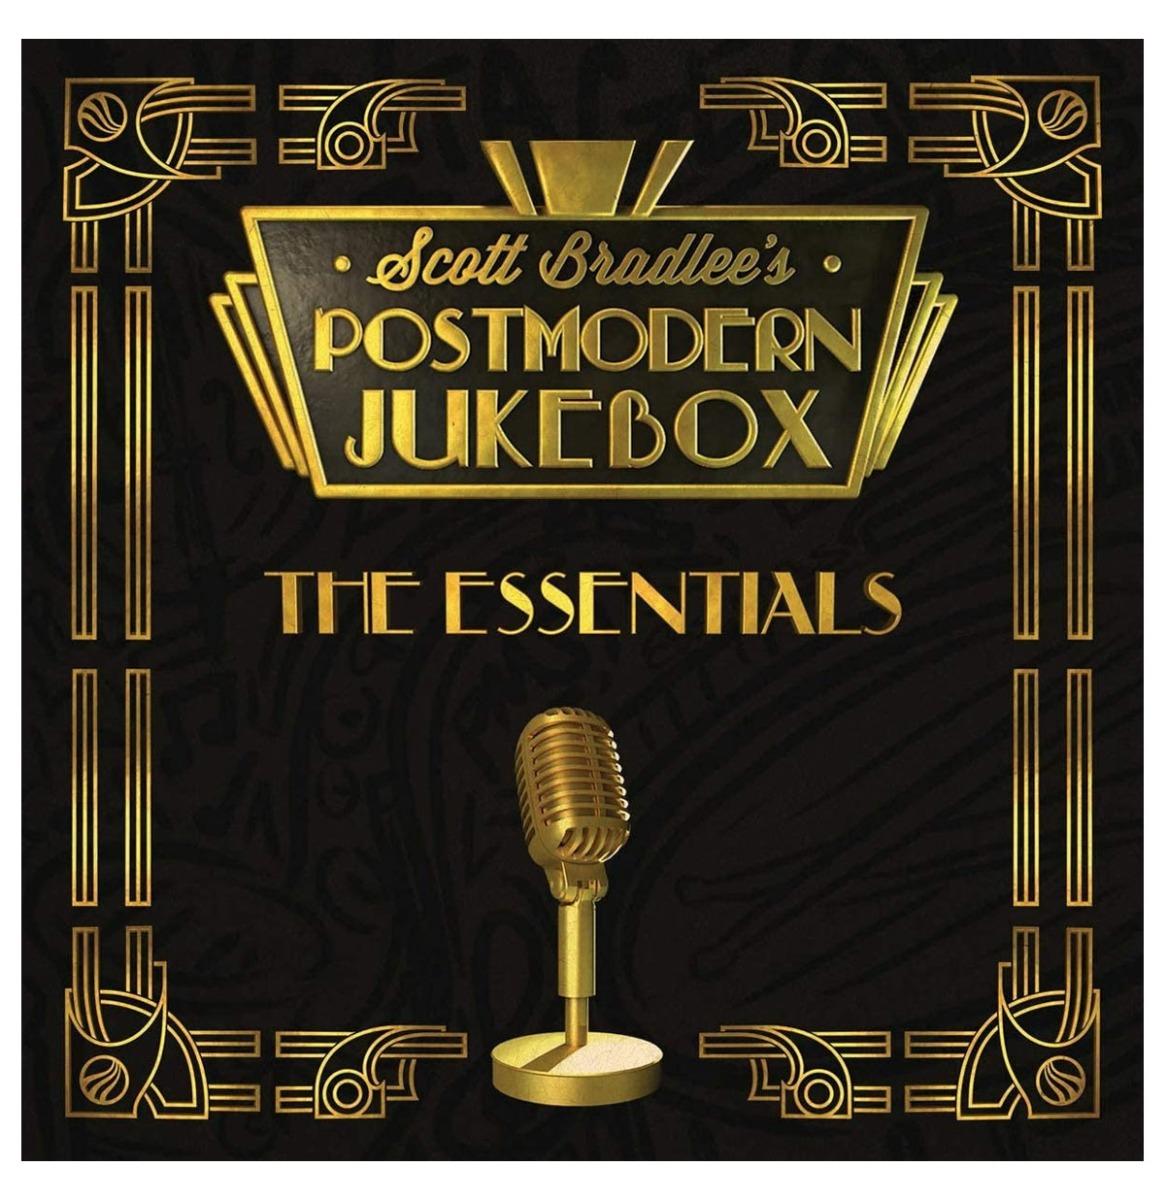 Scott Bradlee's Postmodern Jukebox - The Essentials 2-LP